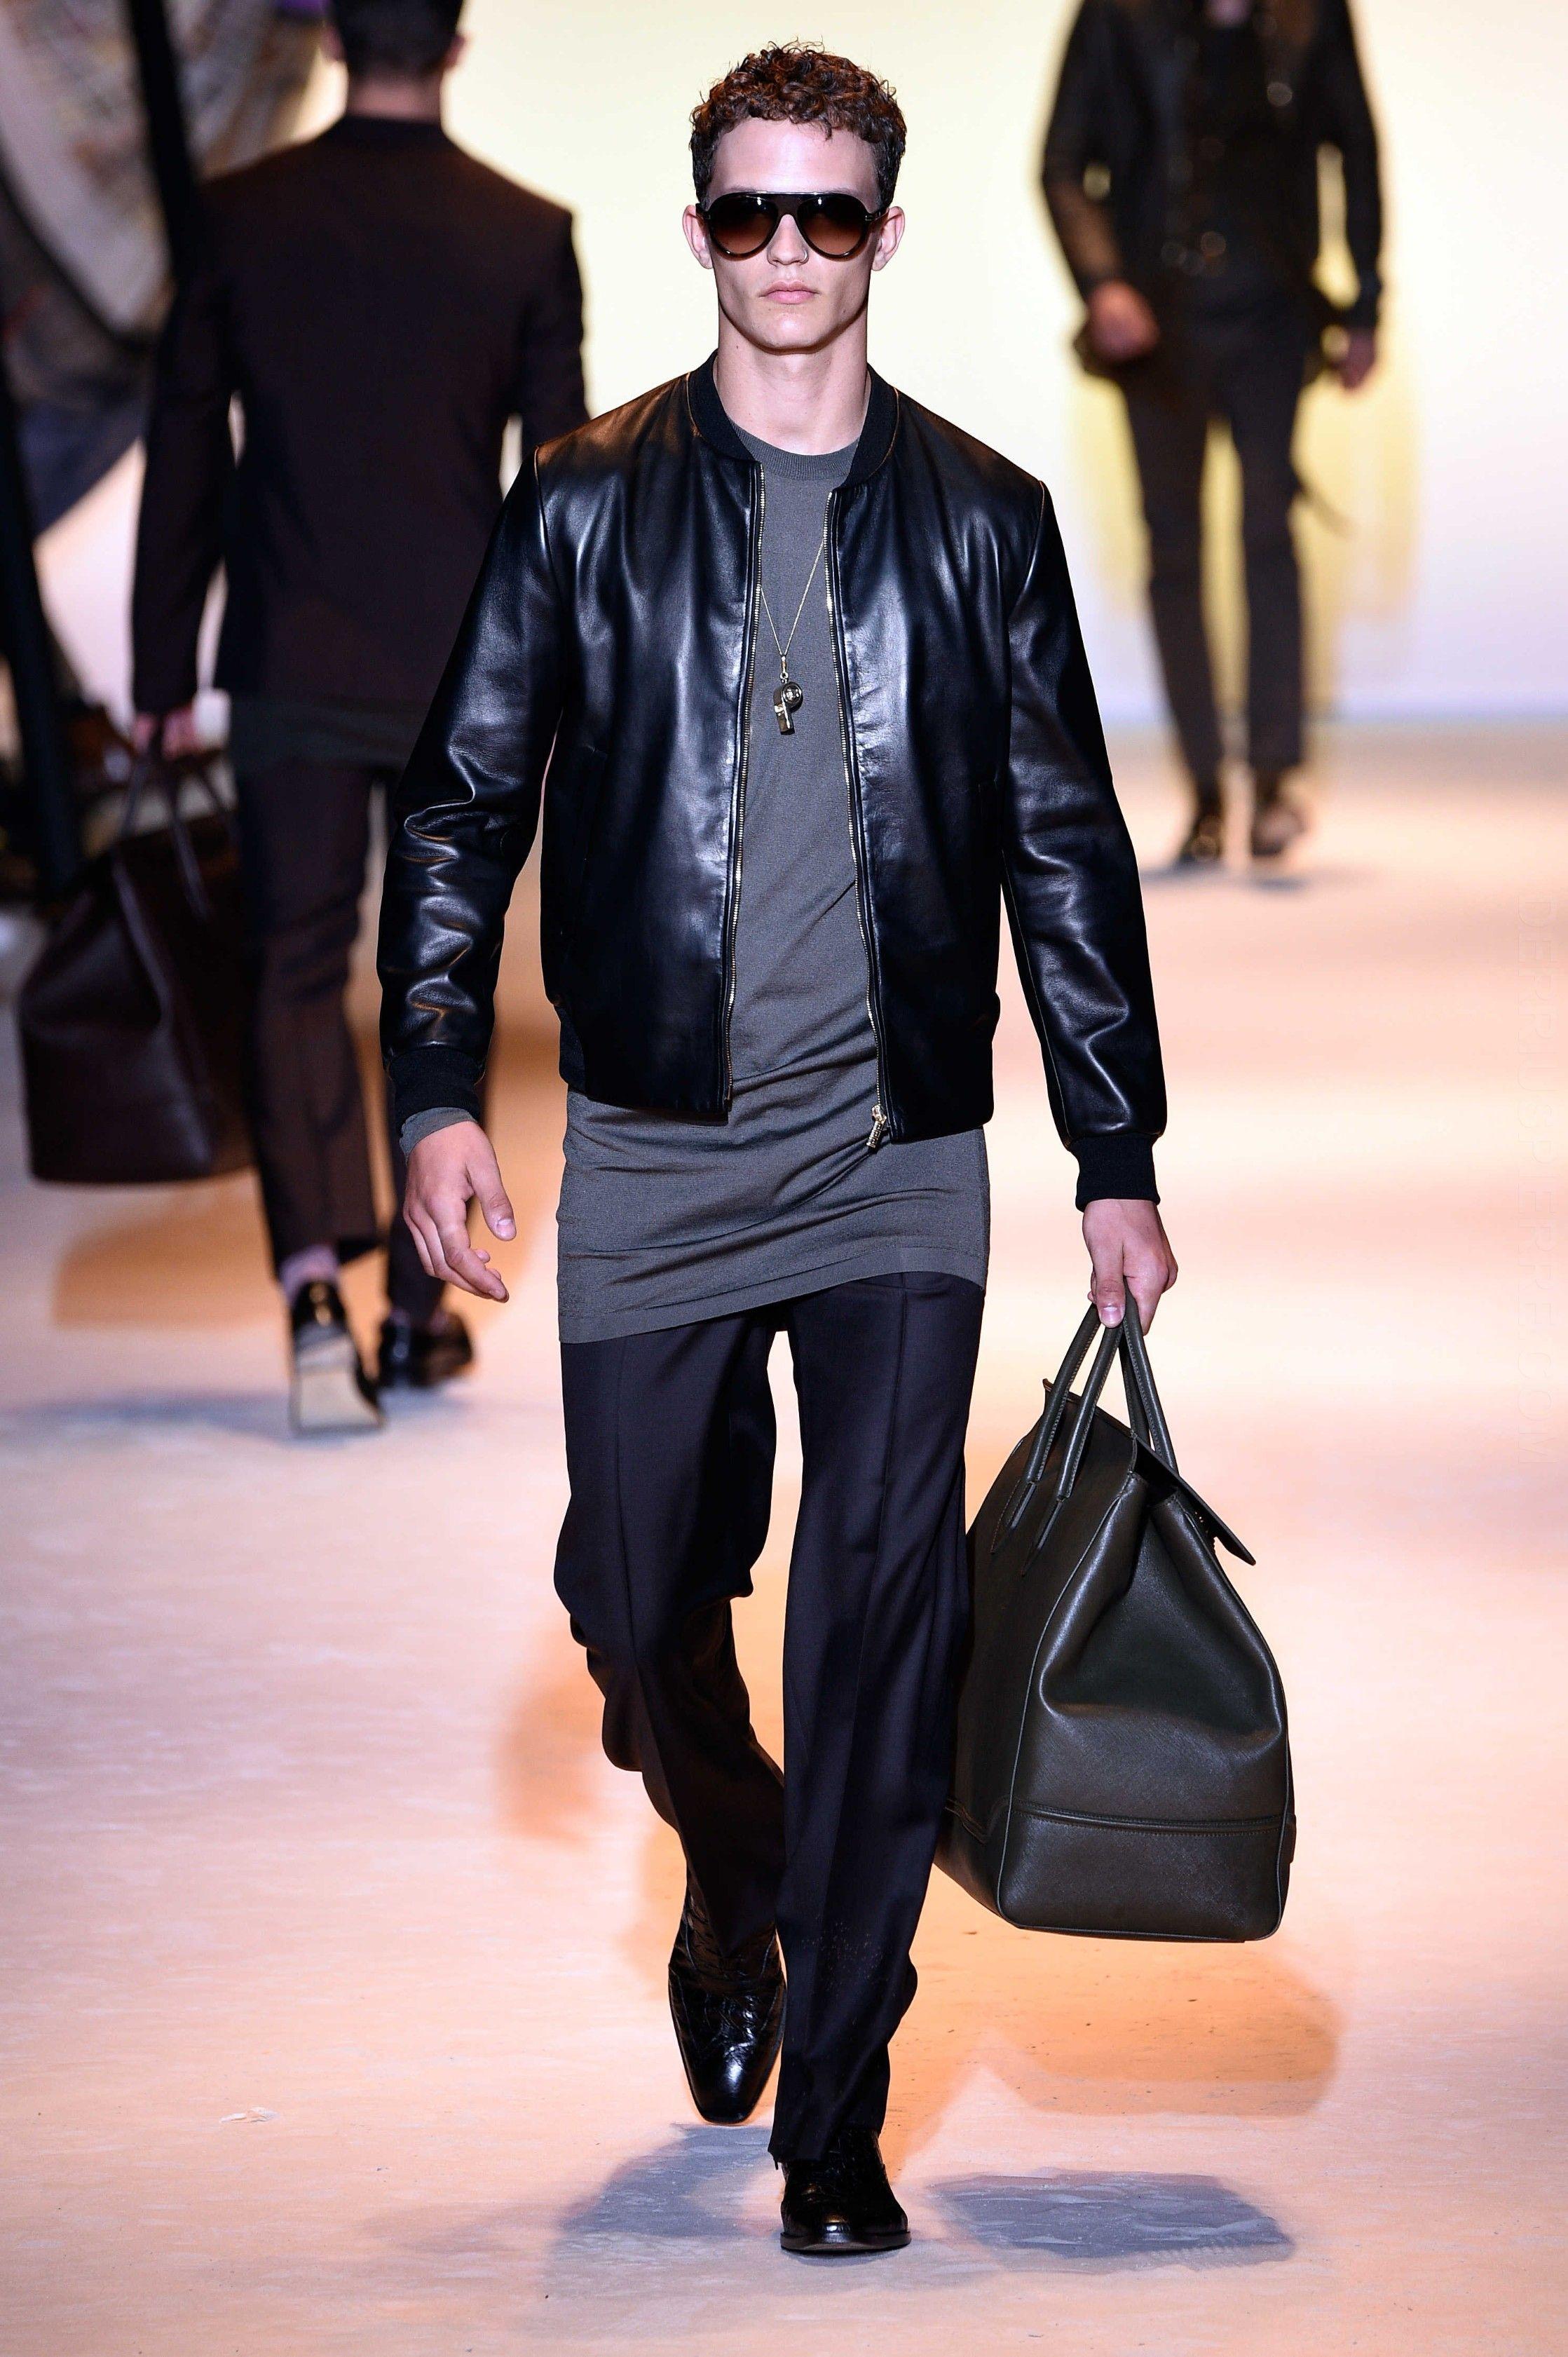 Versace Spring Summer 2016 Primavera Verano Collection - #Menswear #Trends #Tendencias #Moda Hombre Milan Fashion Week - D.P.